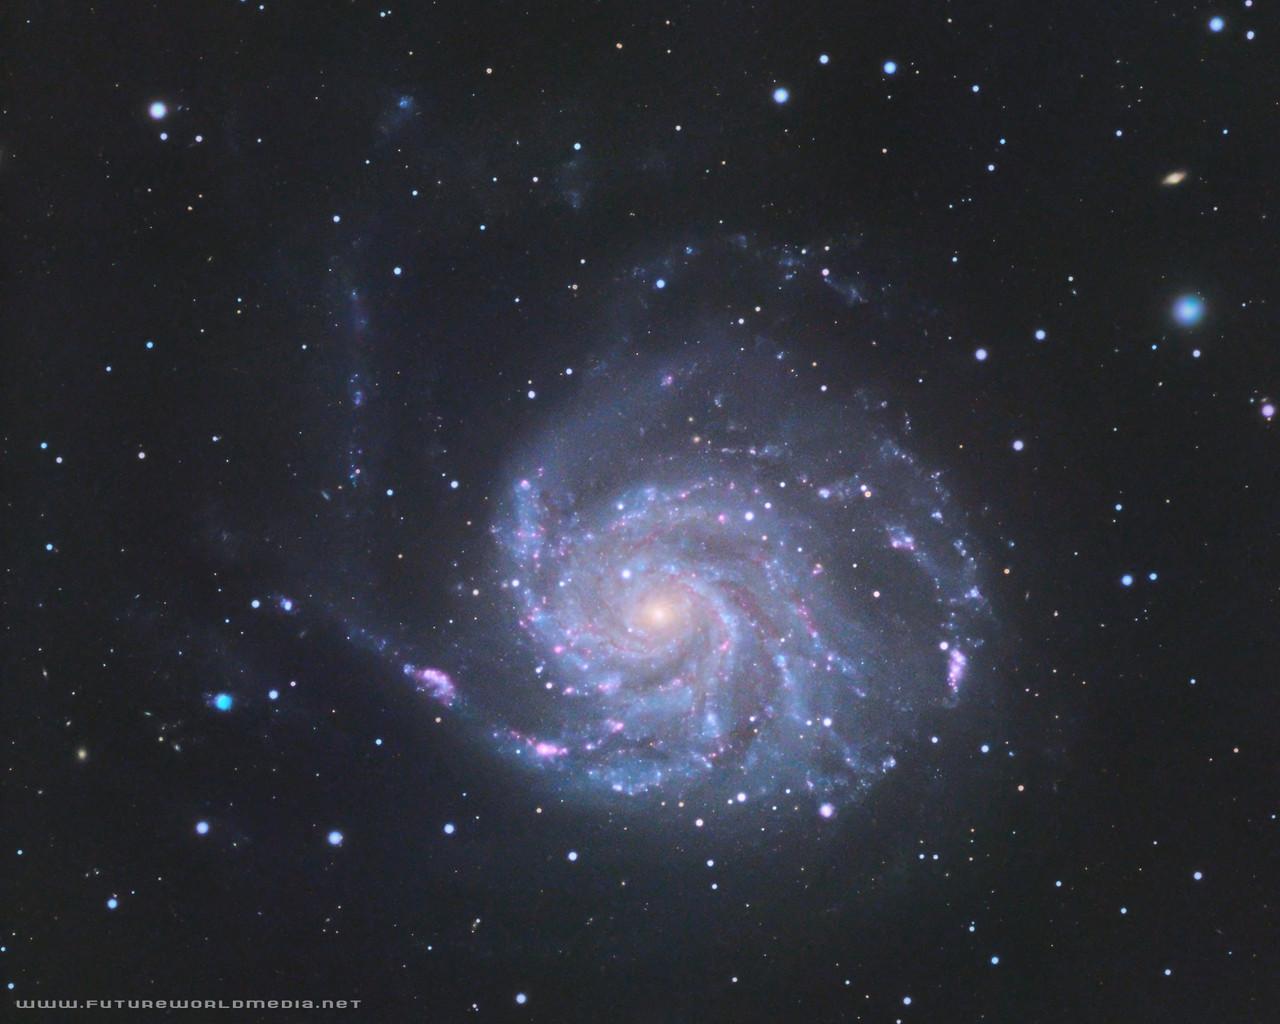 M101 Douglas J Struble